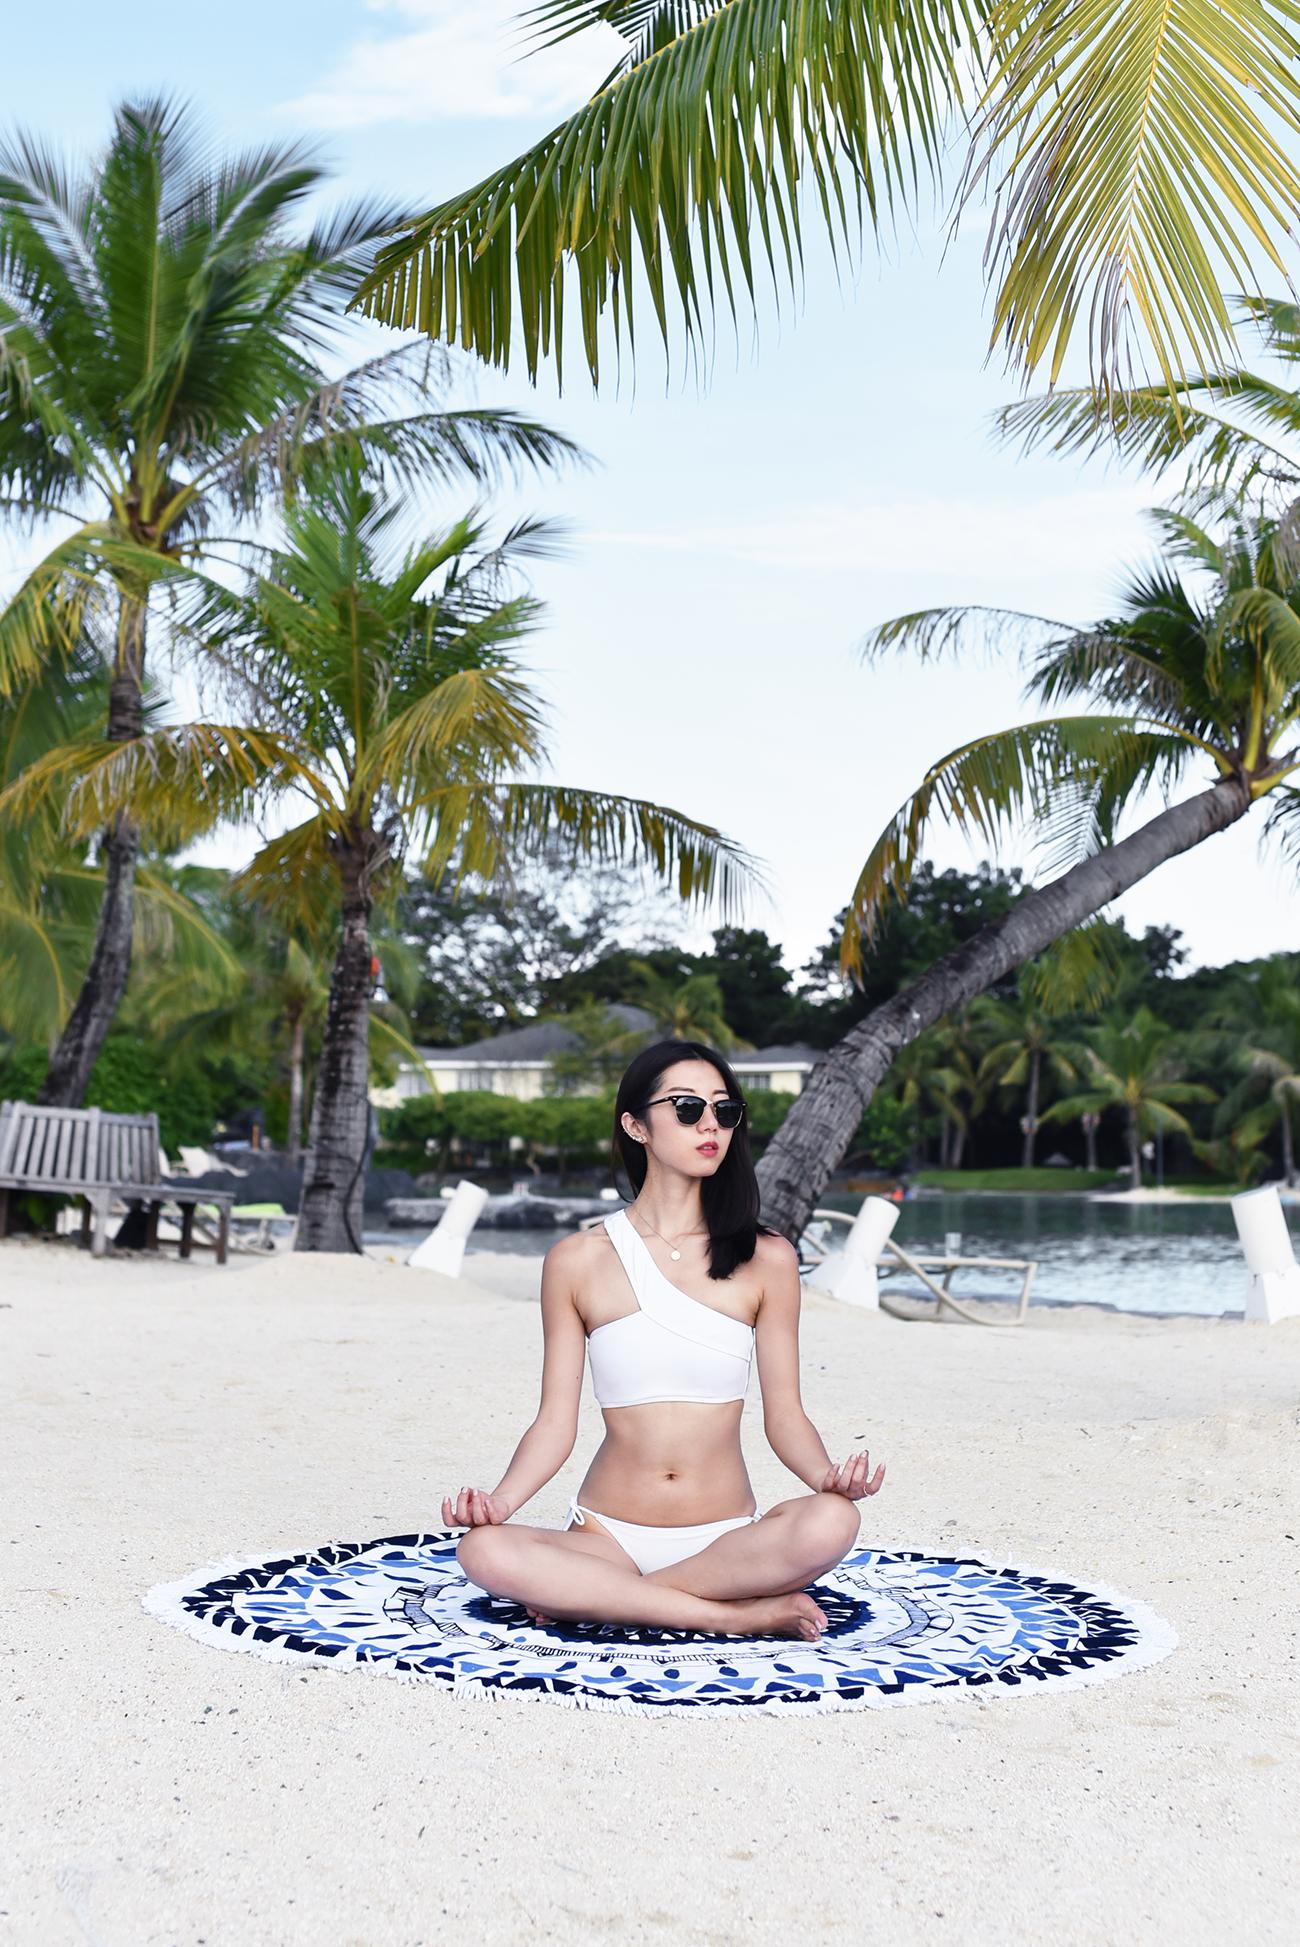 PlantationBay-Cebu-TheBeachPeople-Bikini-2